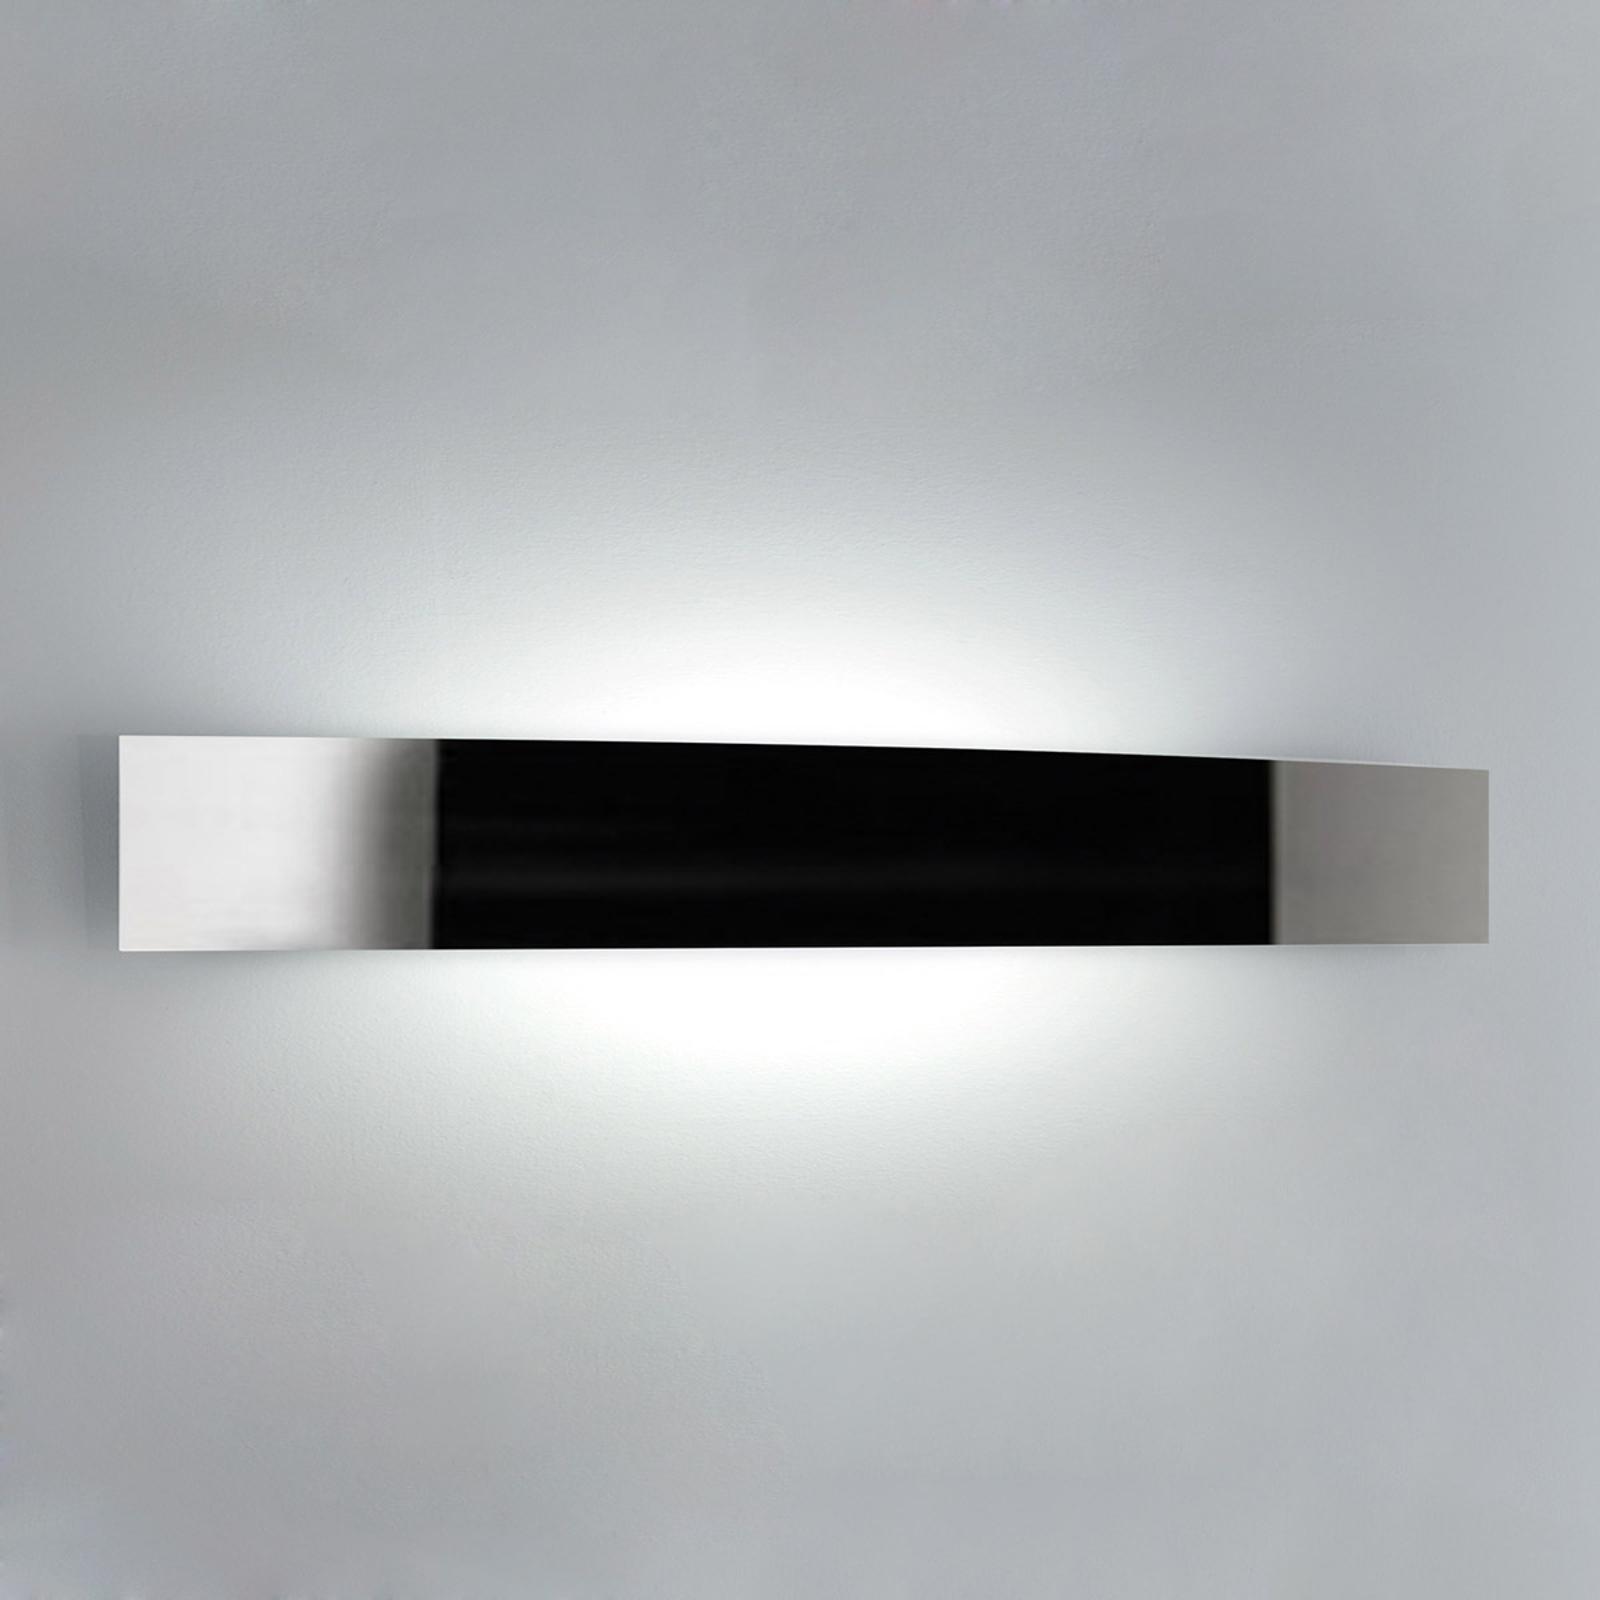 Elegant wall light RIGA, 56 cm wide_3520222_1